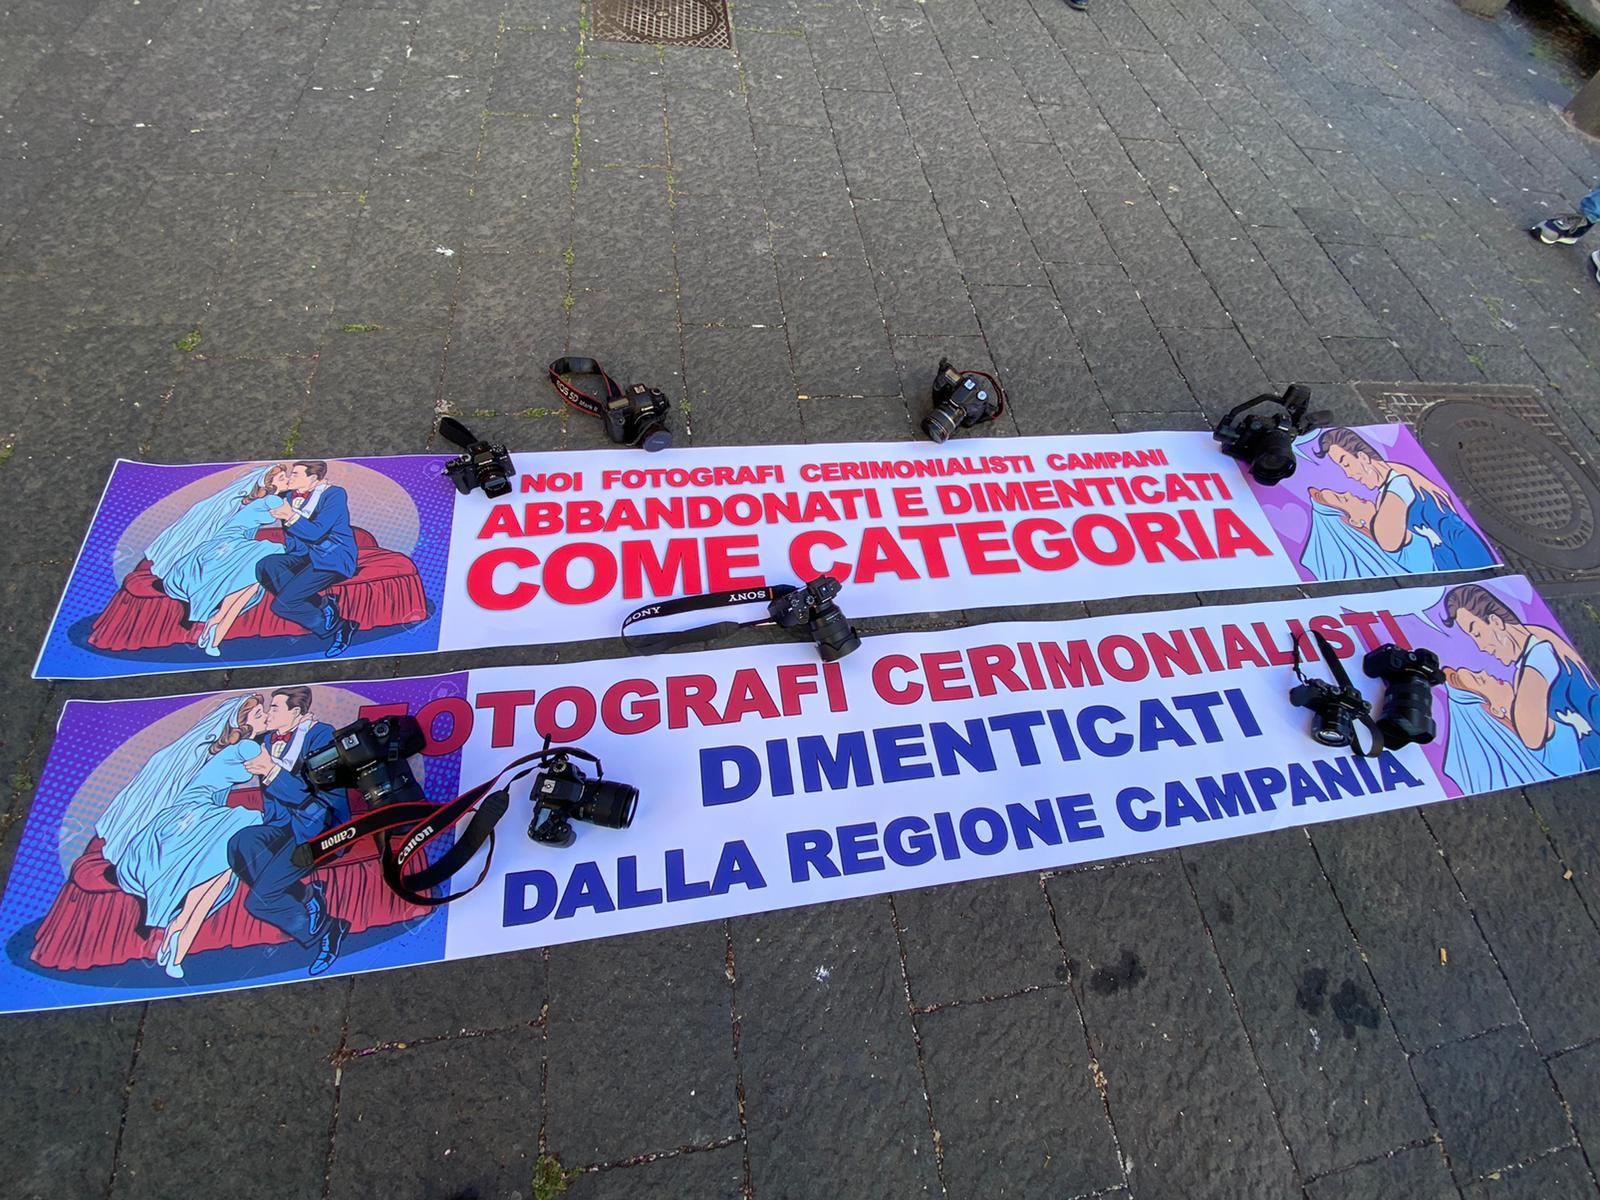 La protesta dei fotografi cerimonialisti campani, fotografi campania, regione campania, emergenza coronavirus, napoli, fotografi napoli, fotografi napoli